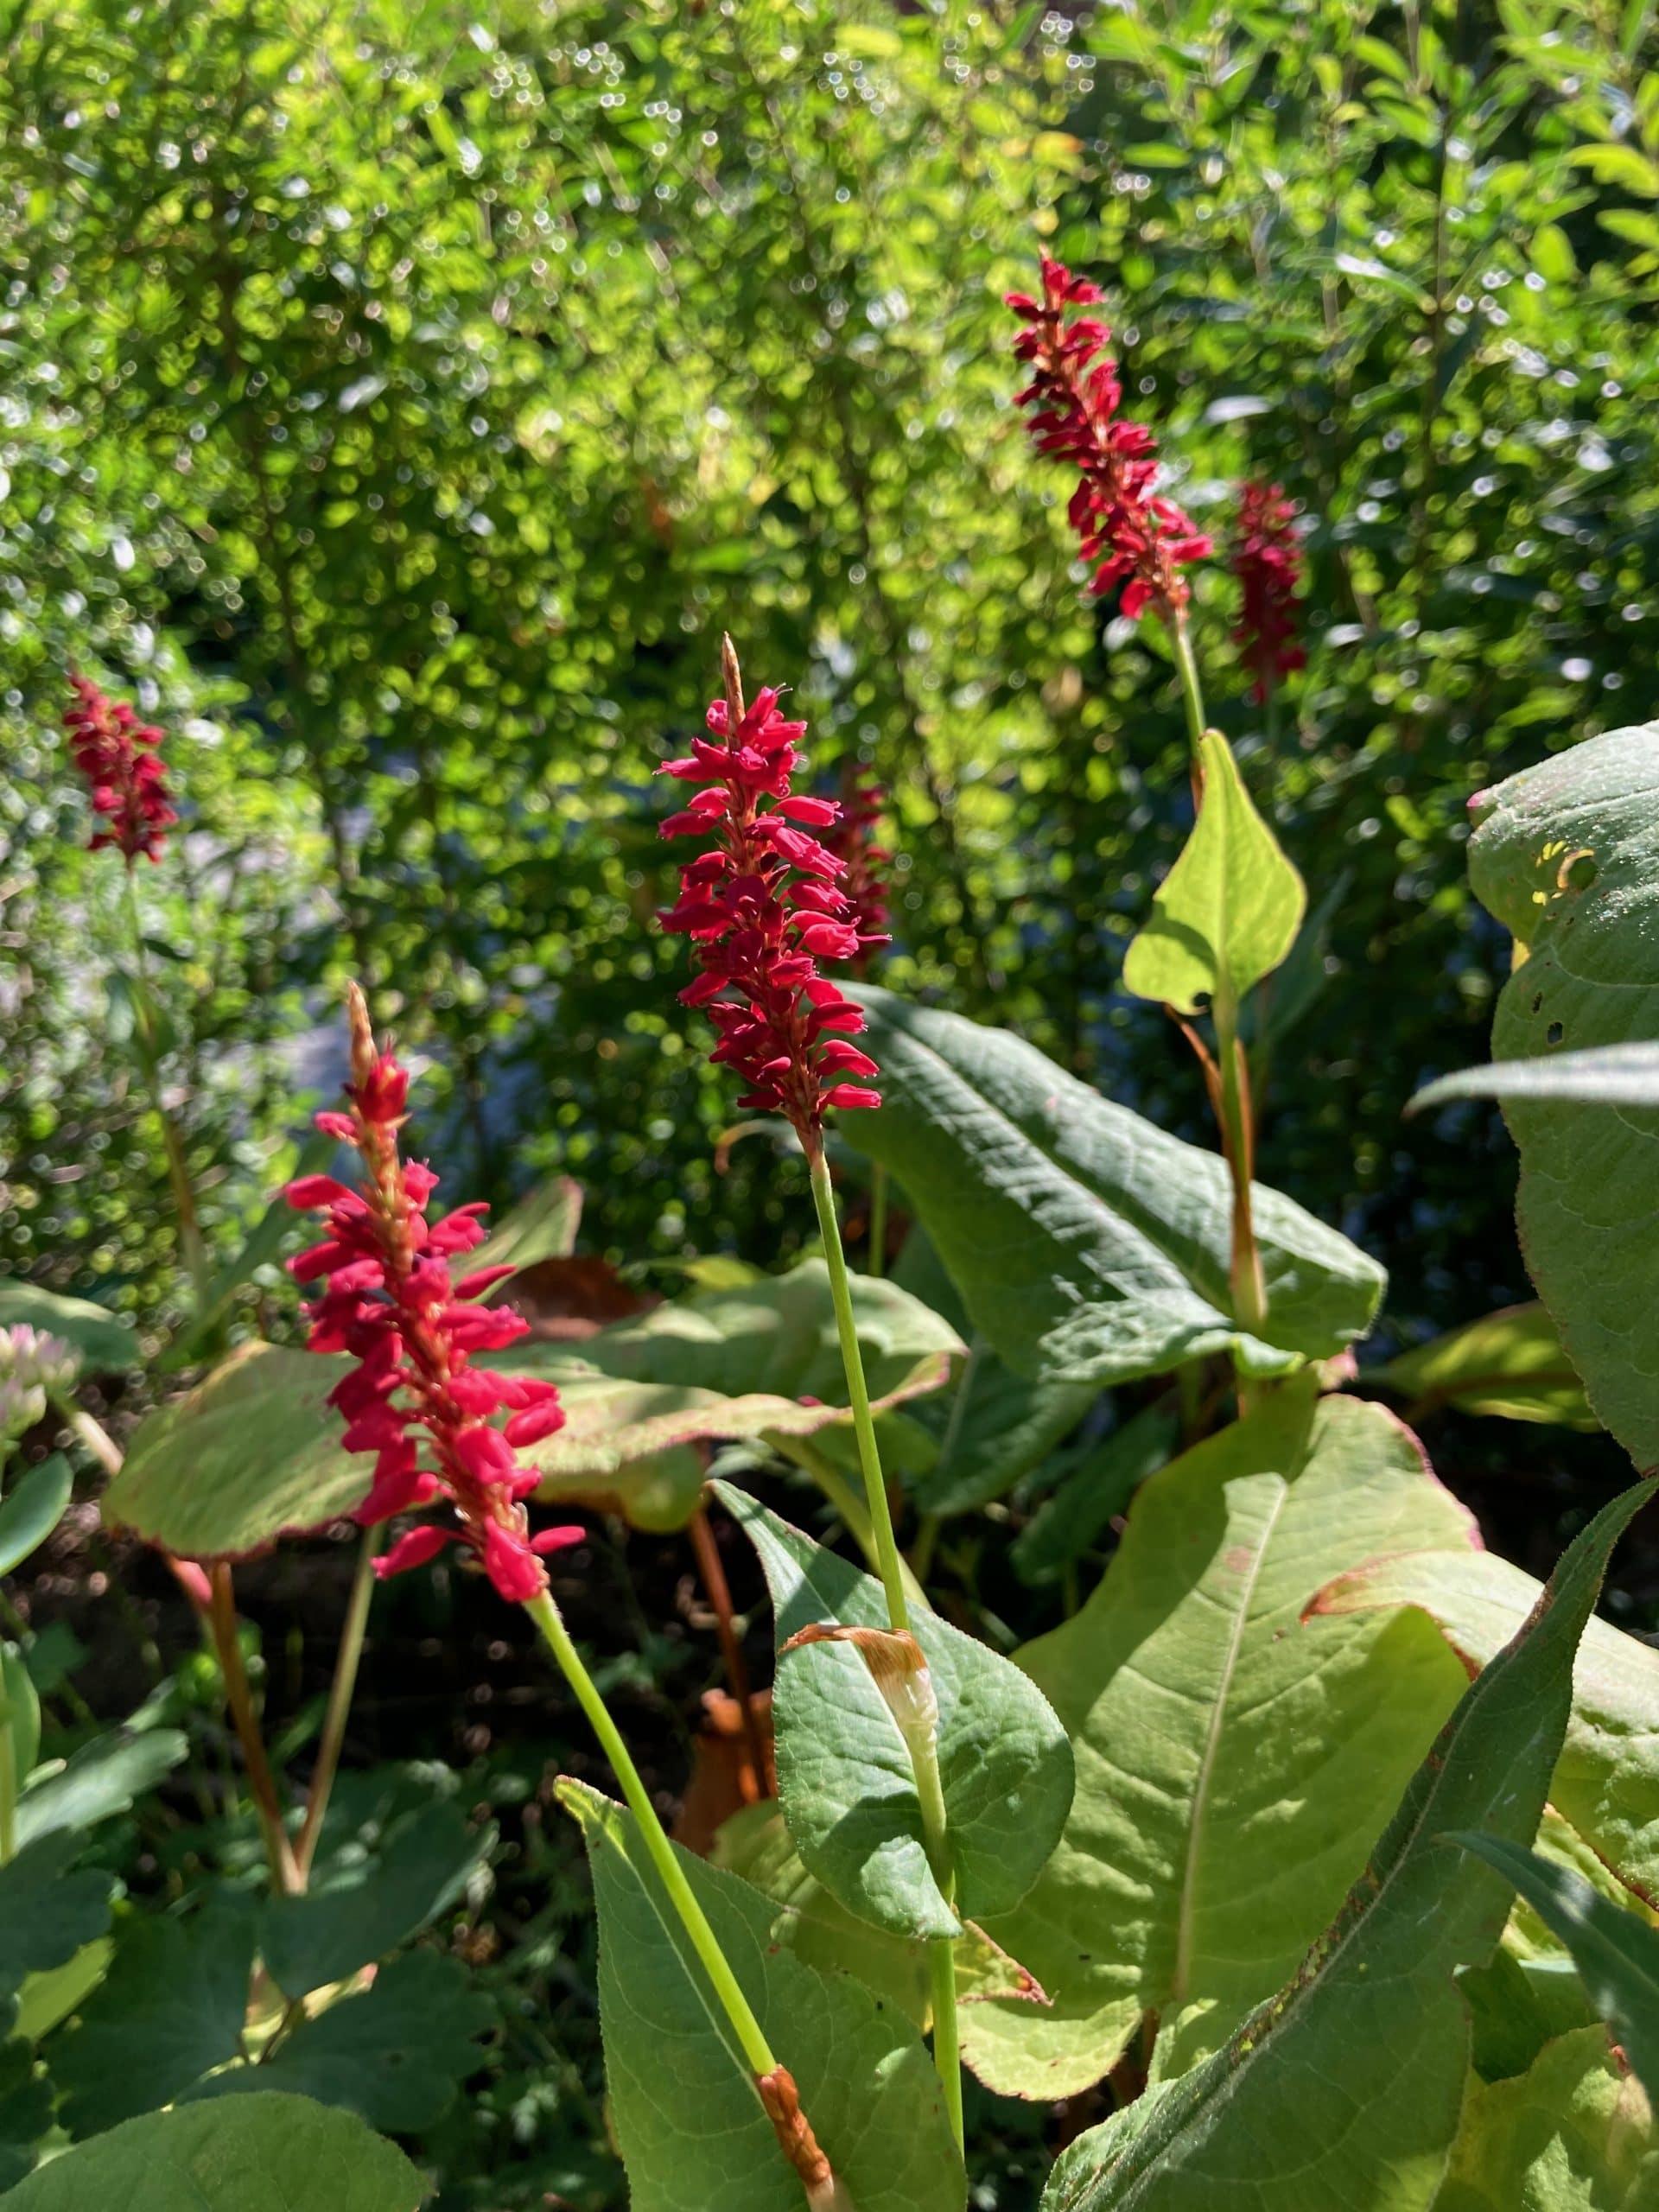 Ugens plante: Kertepileurt